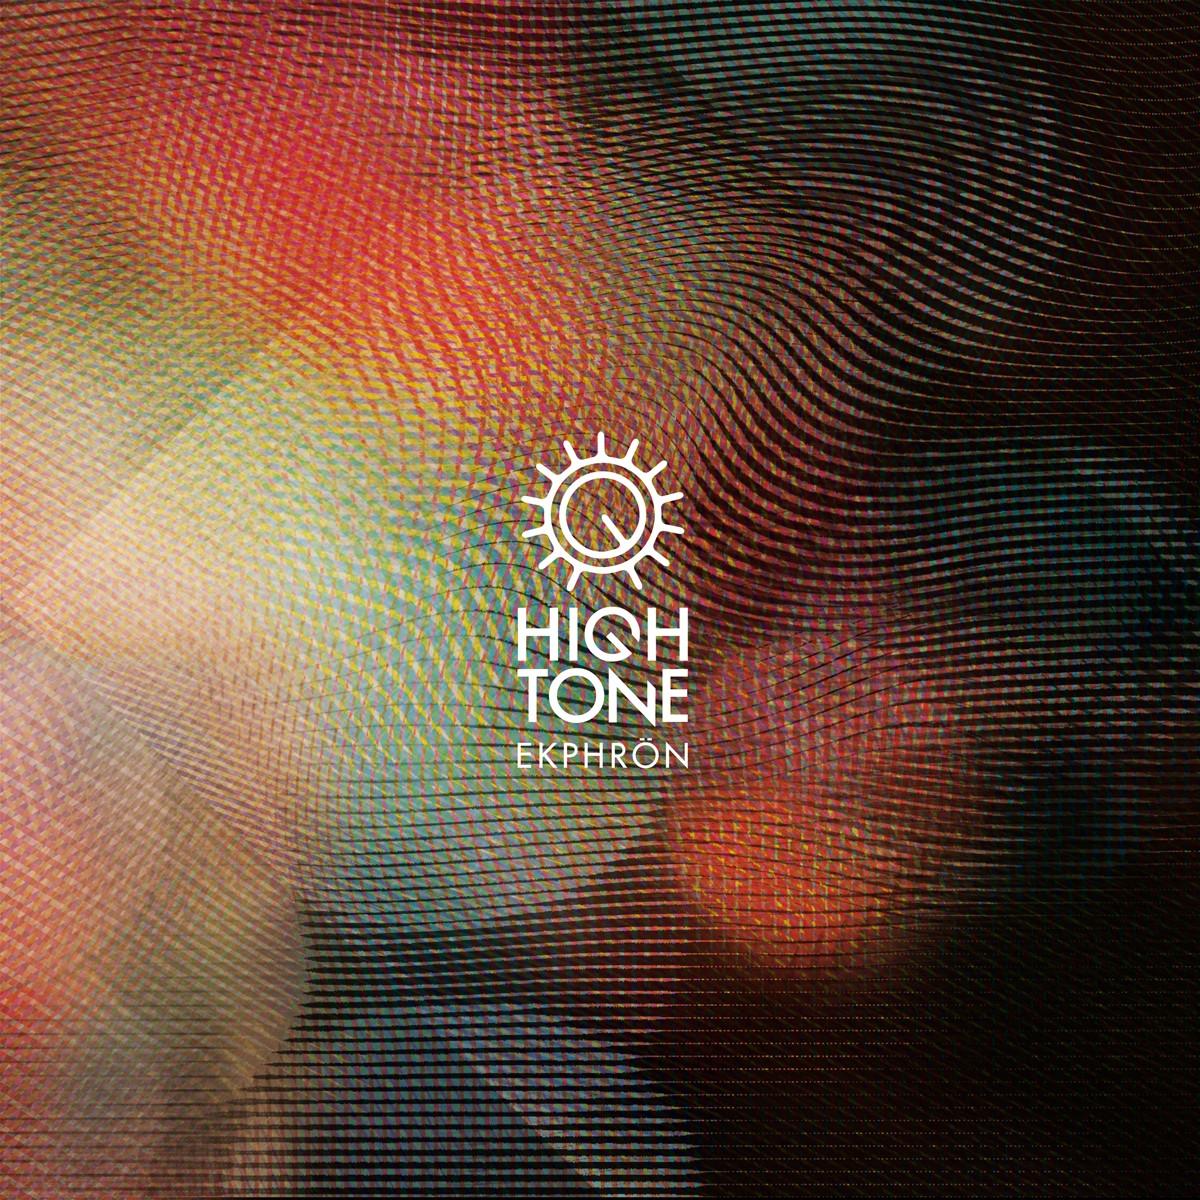 High Tone : ekphron | LP / 33T  |  FR